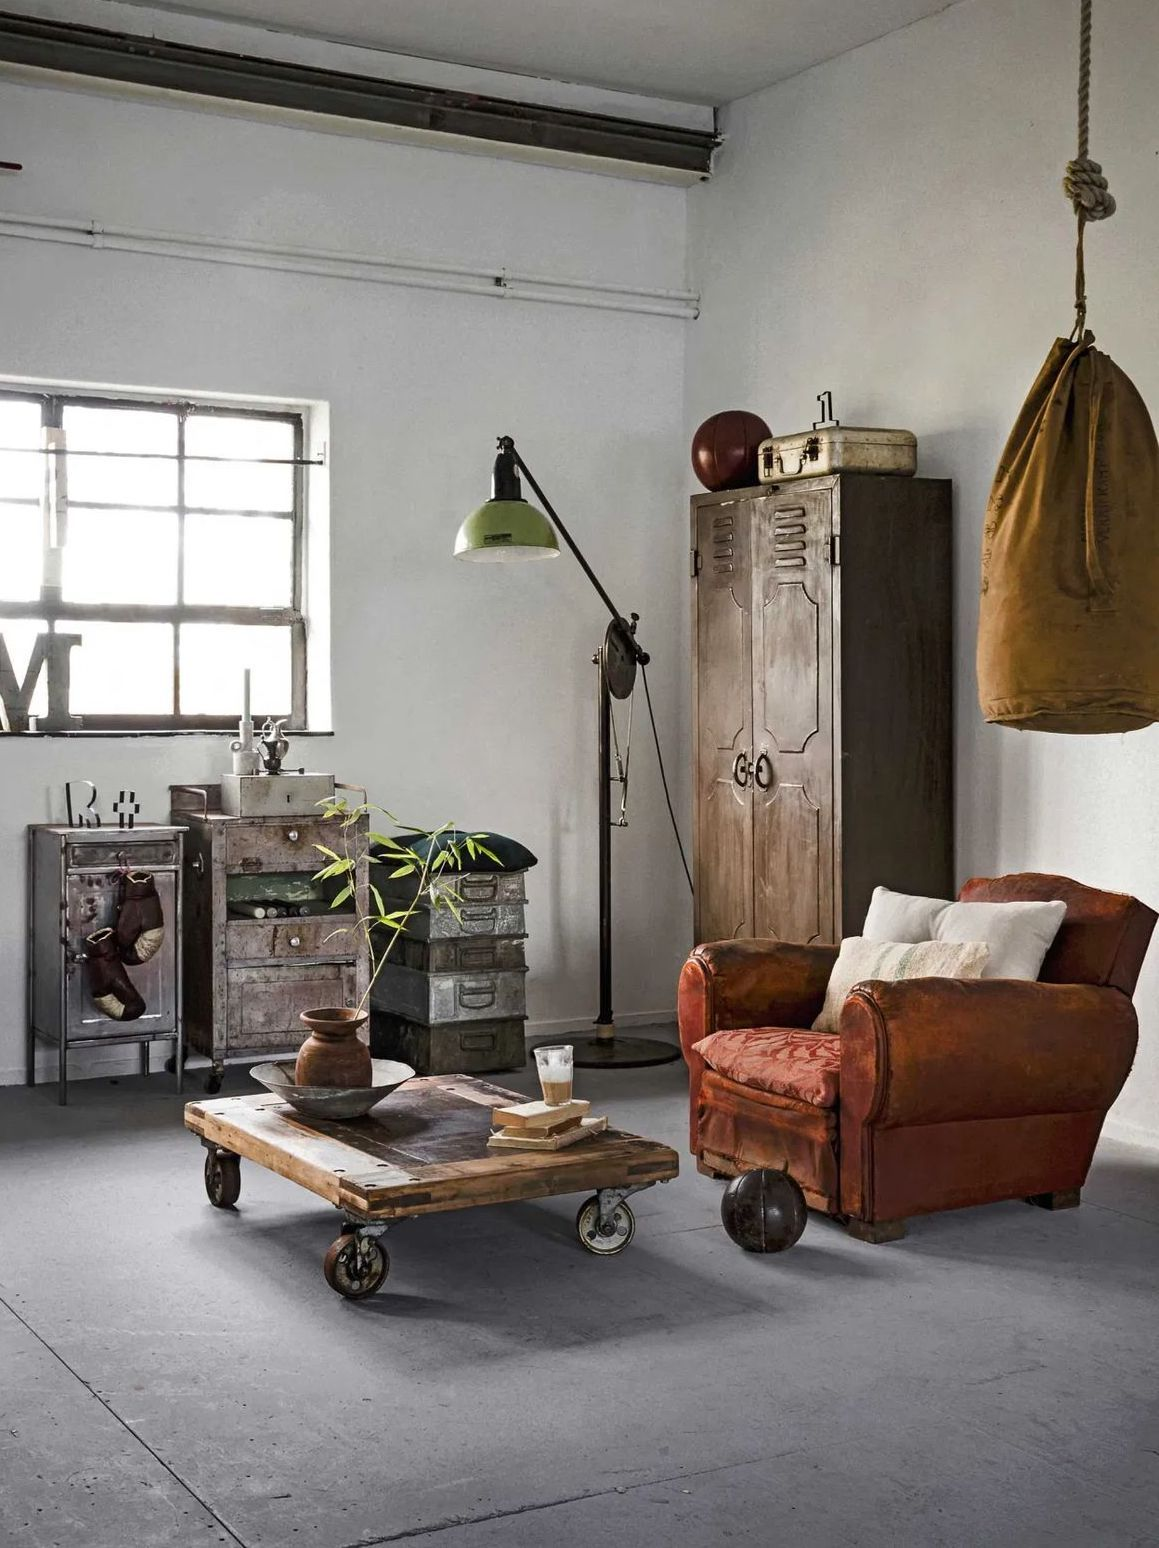 Vintage Möbel Industriestil Betonboden über VTWonen